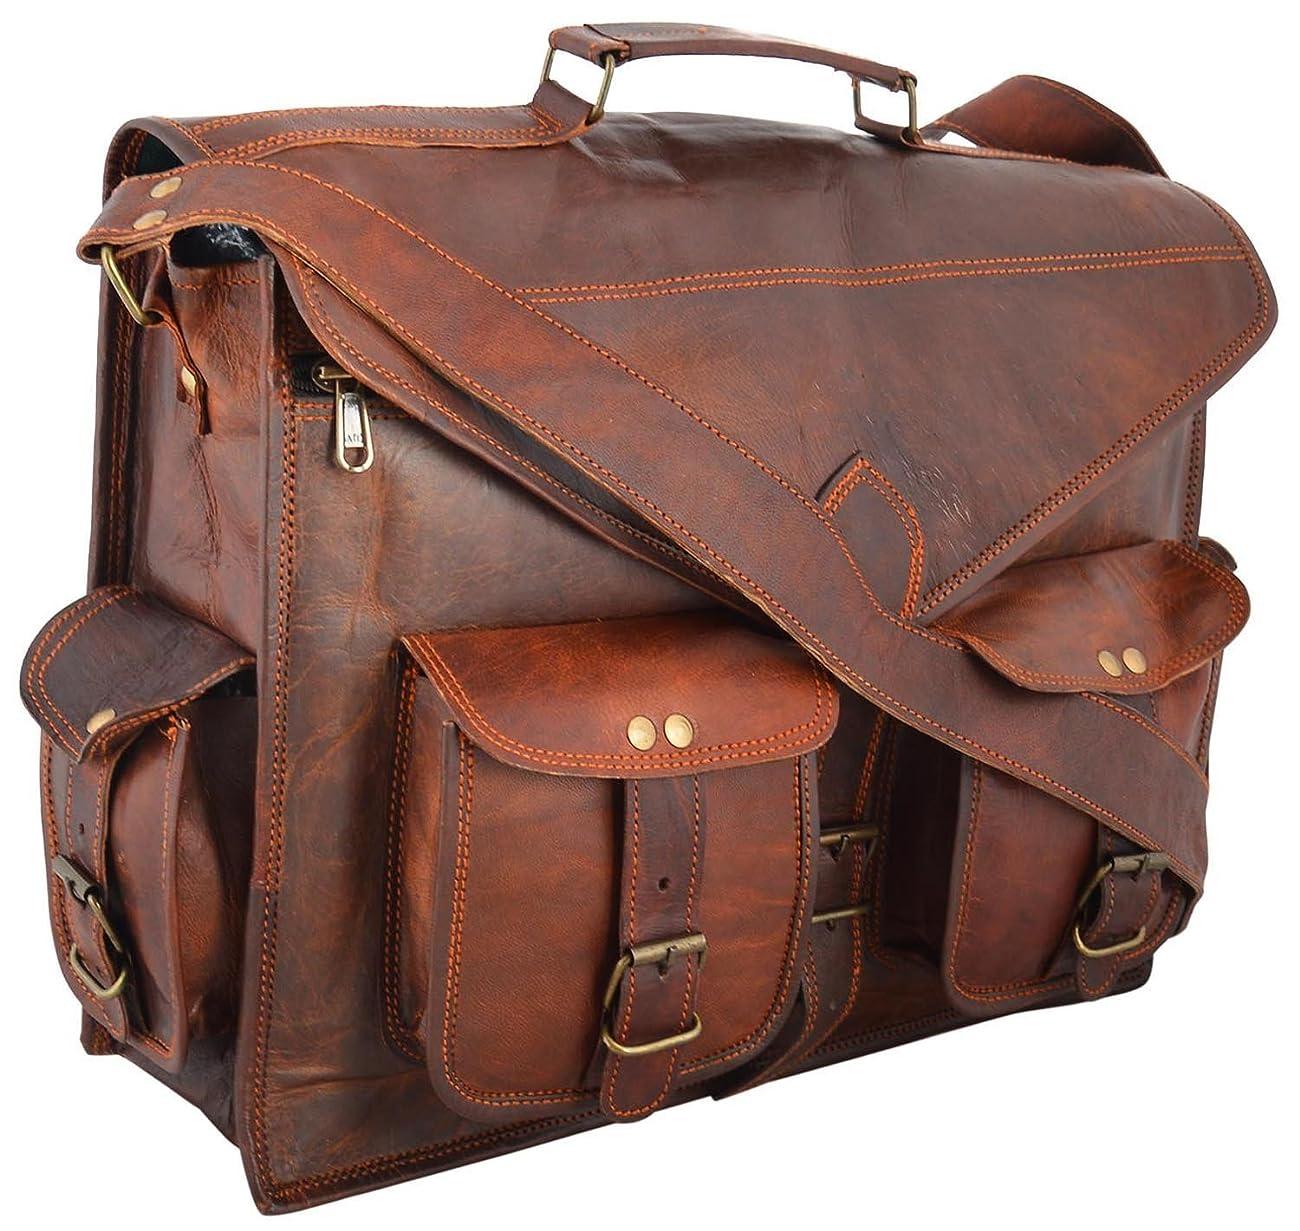 Handmadecraft ABB 18 Inch Vintage Handmade Leather Messenger Bag for Laptop Briefcase Satchel Bag 0